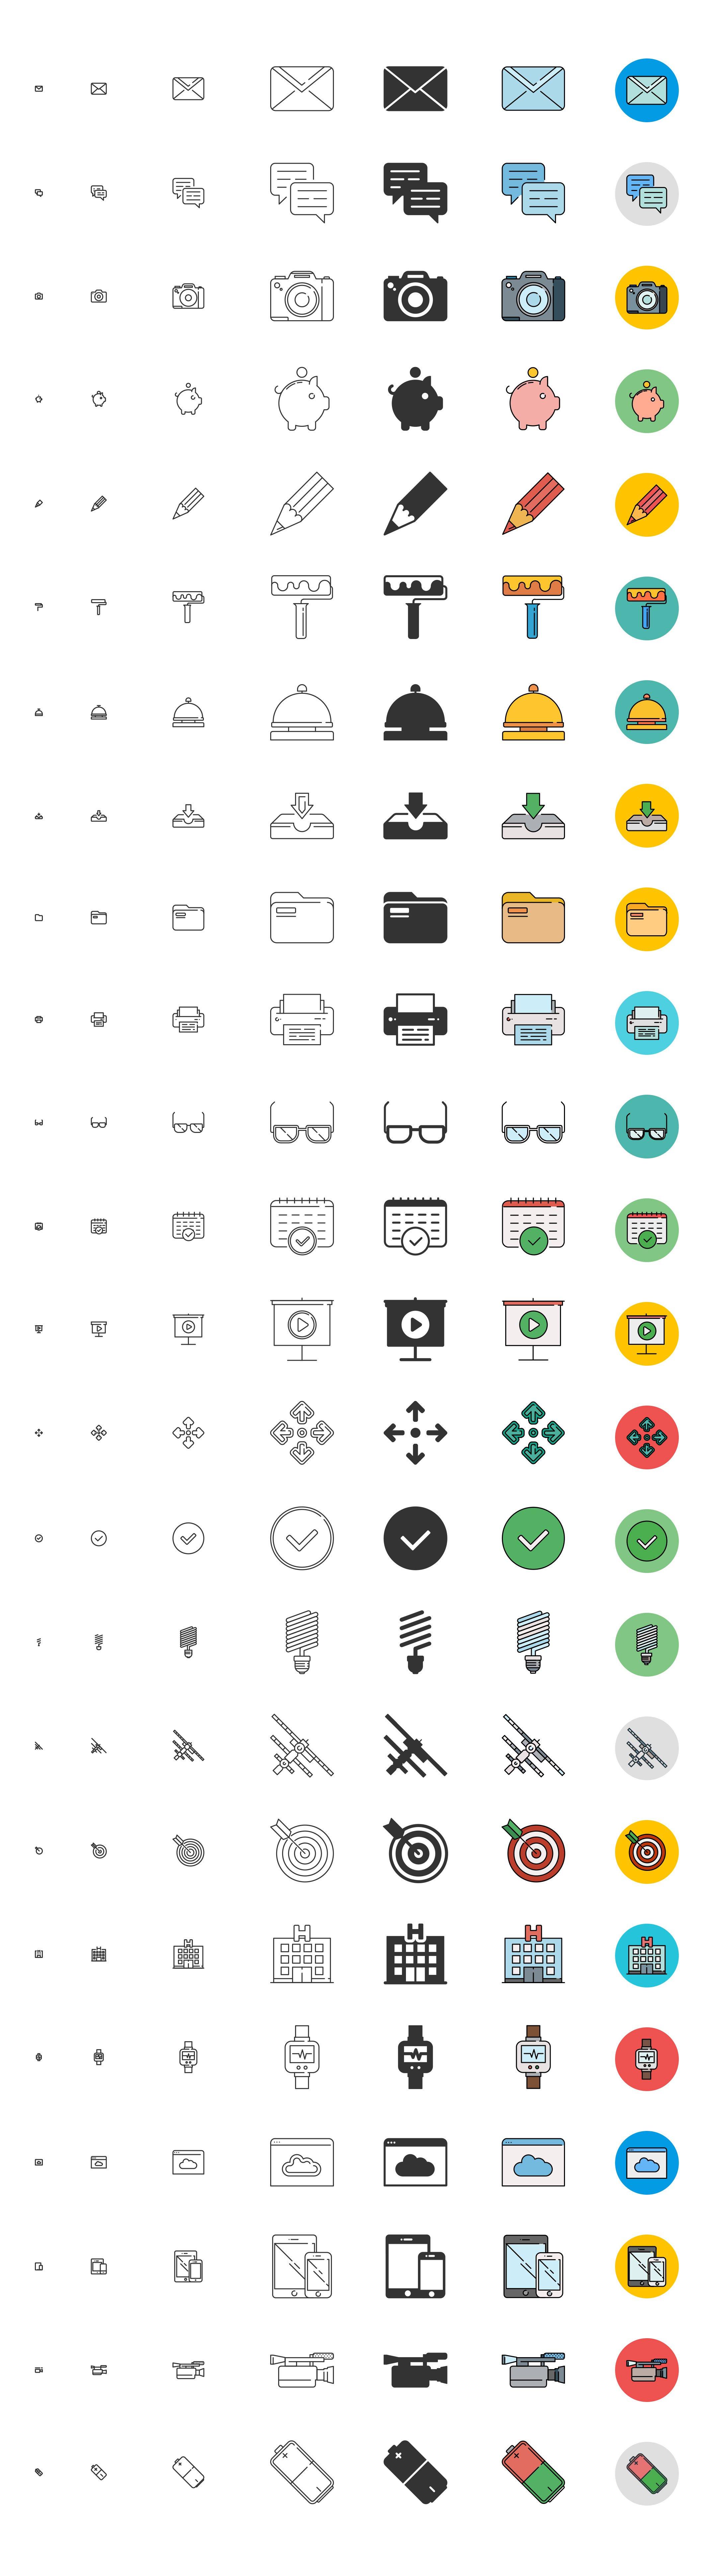 Free-responsive-icons-set